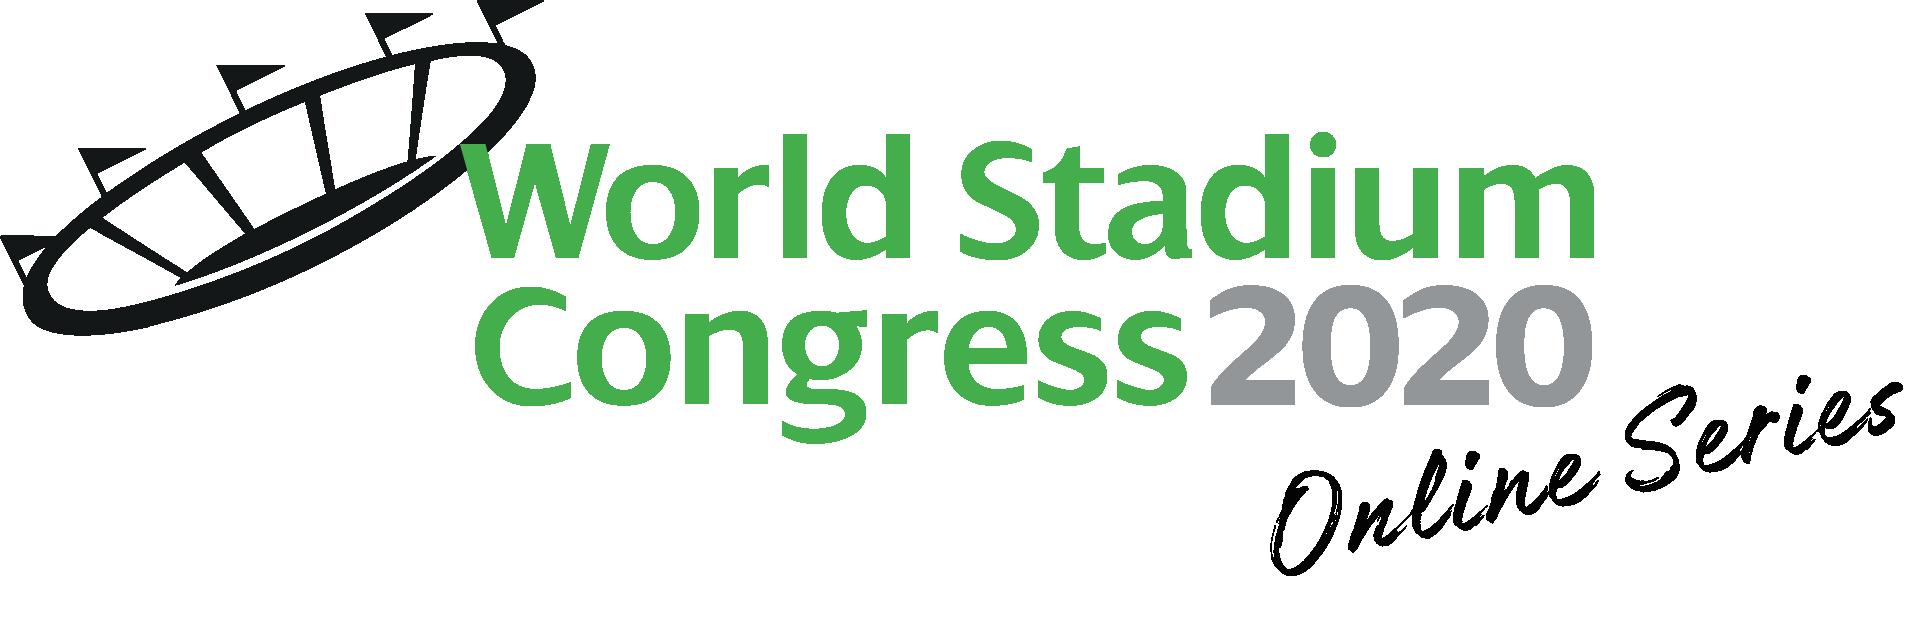 World Stadium Congress